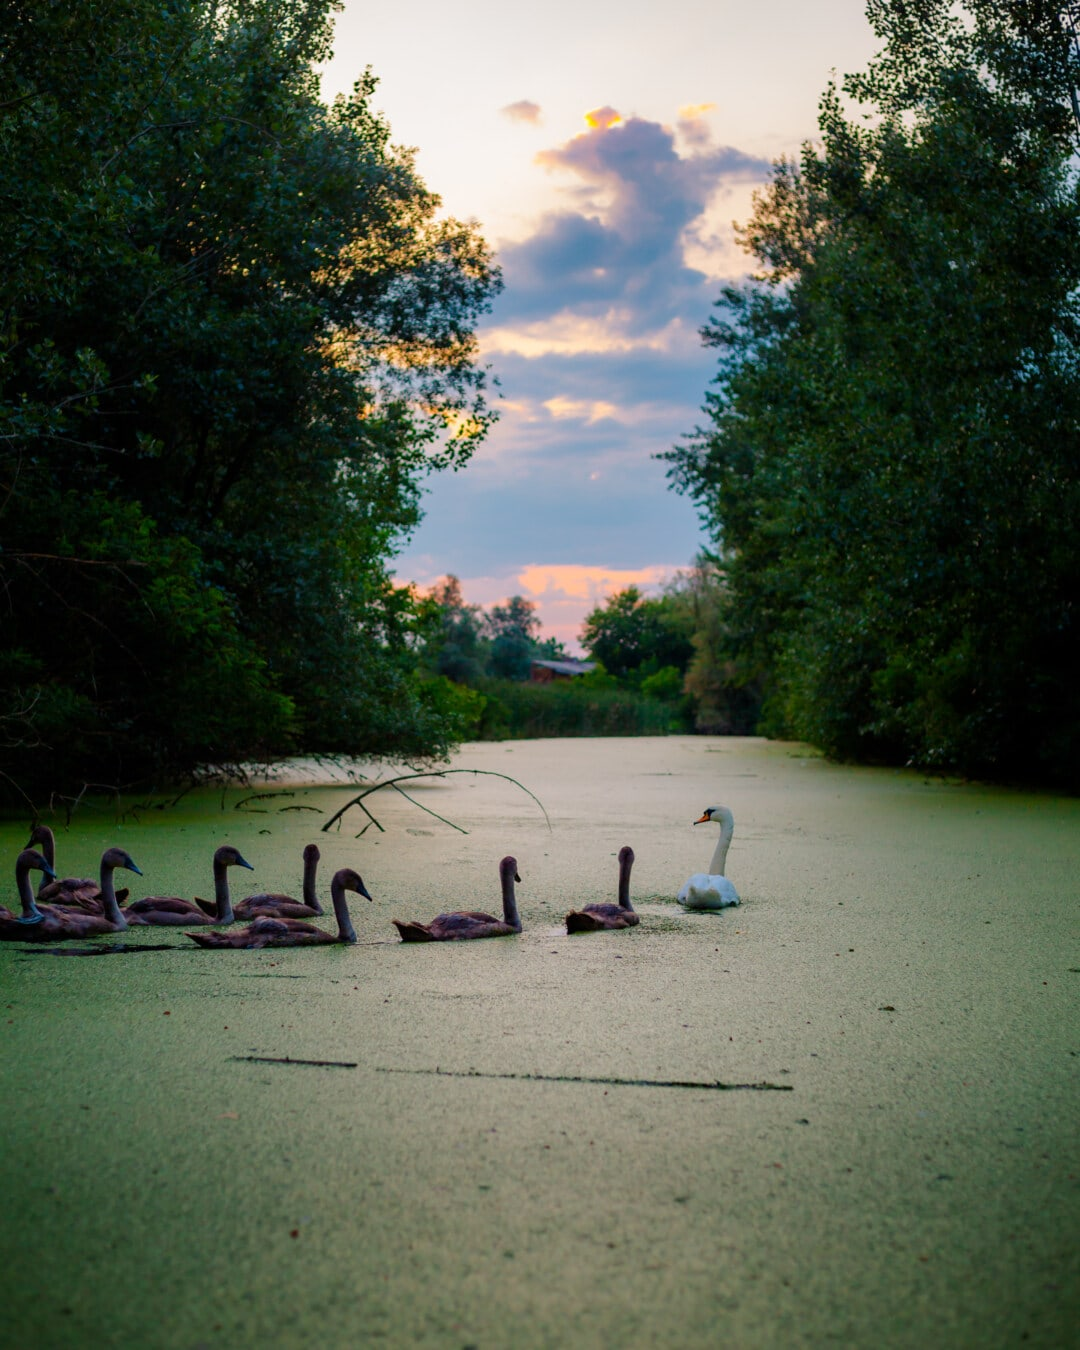 marshlands, swamp, dusk, bird family, swan, young, birds, tree, park, lake